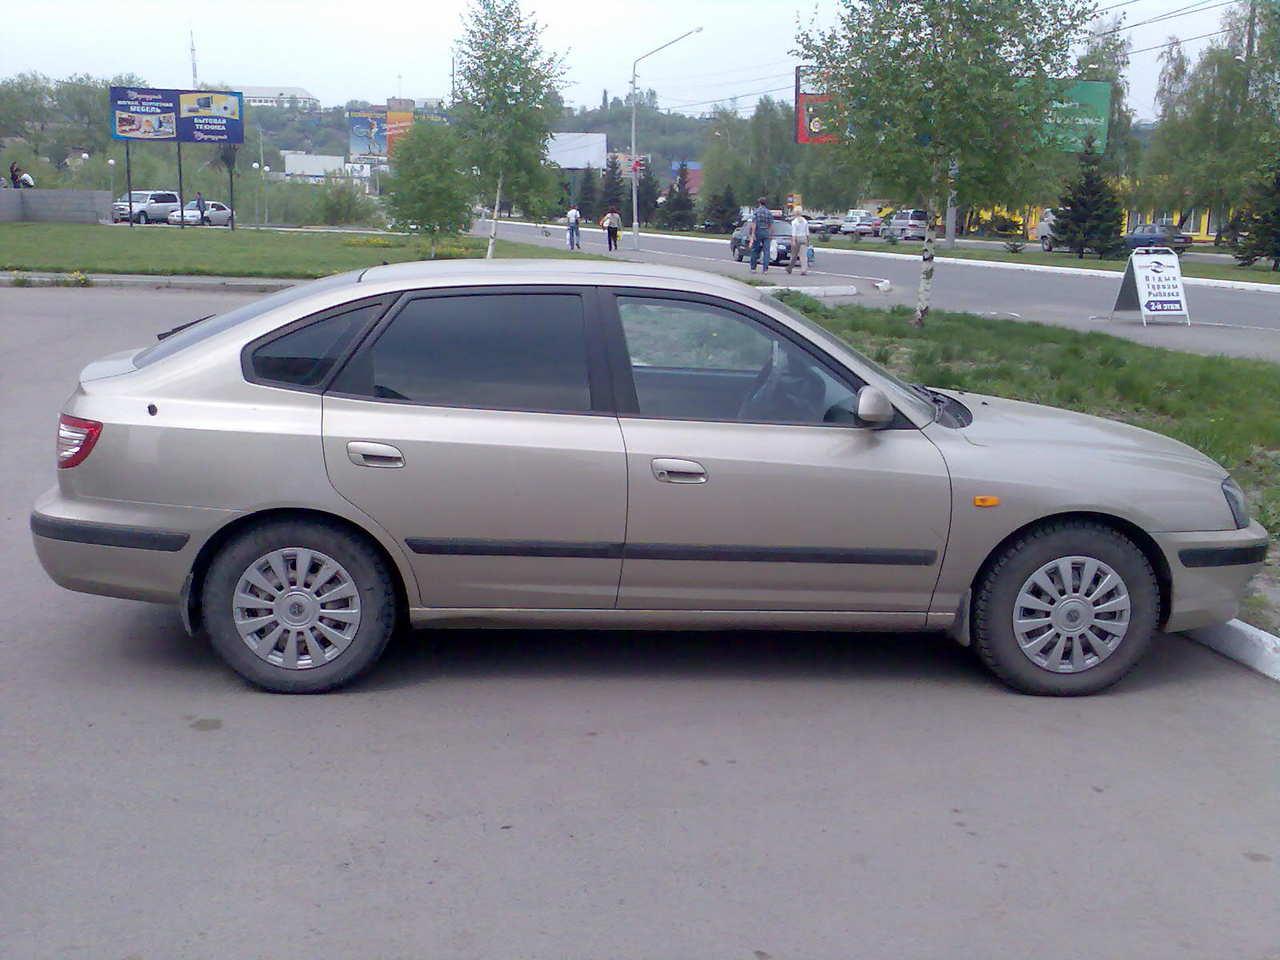 2006 Hyundai Elantra Pictures, 1600cc., Gasoline, FF, Manual For Sale